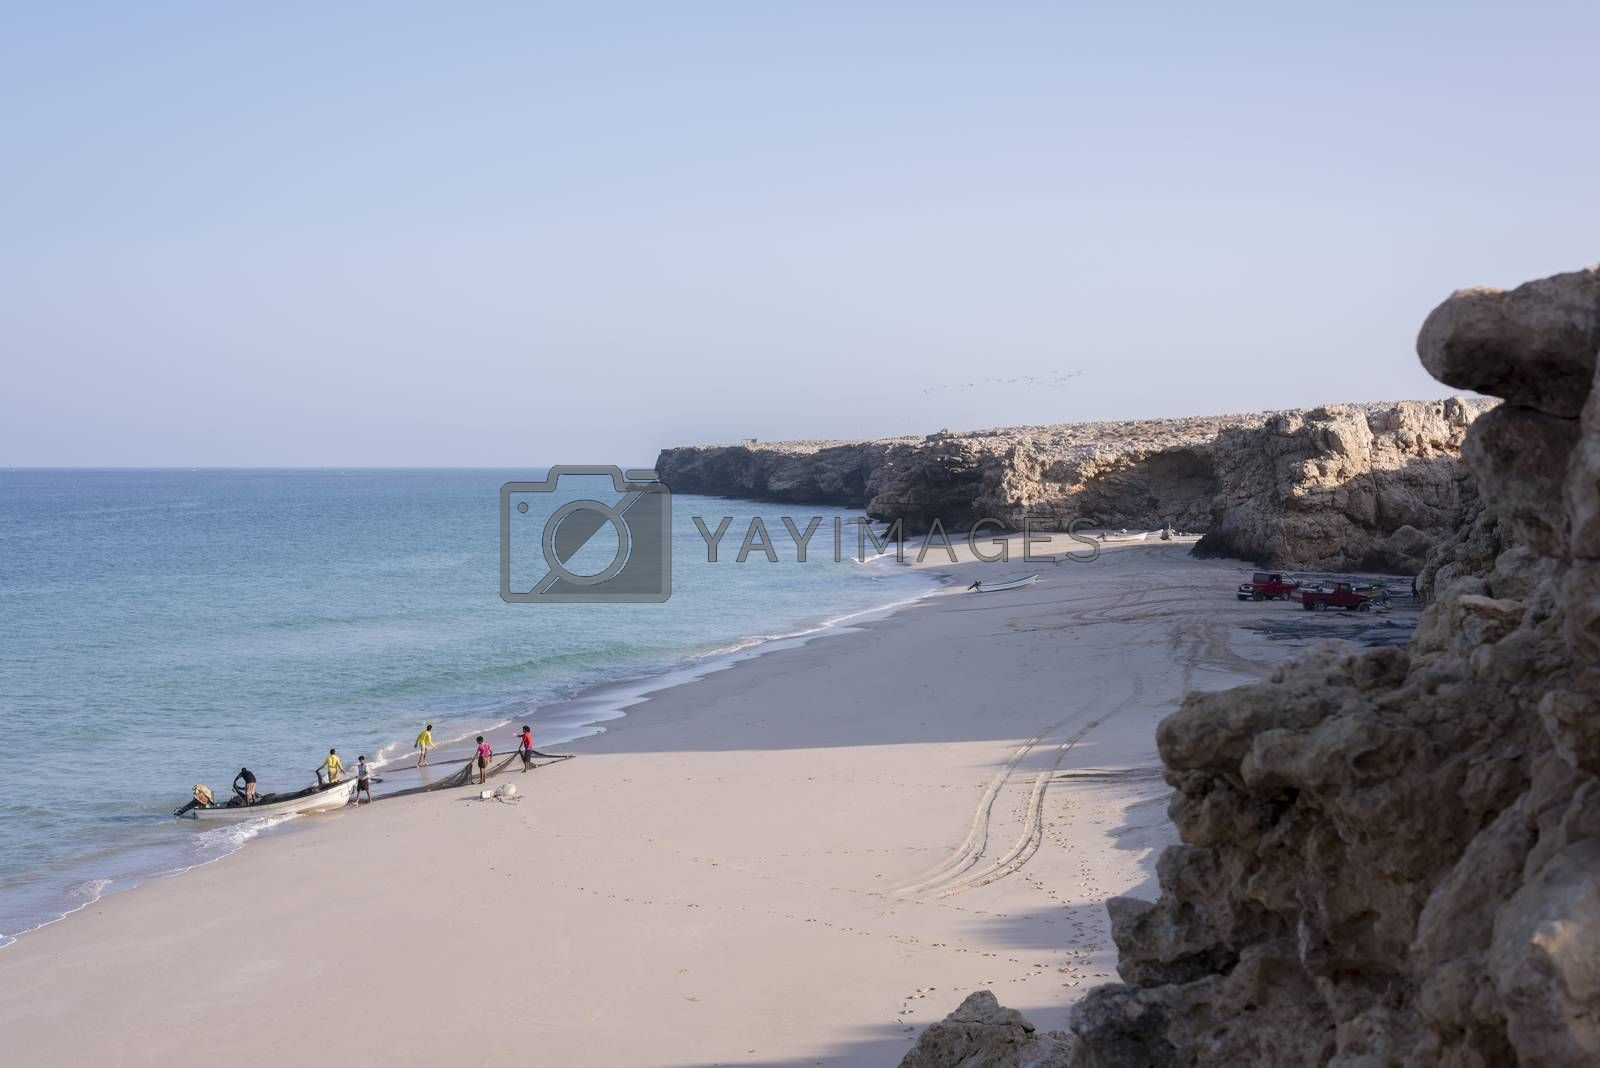 Fishermen pulling their net on the beach of Ras Al Jinz, Oman